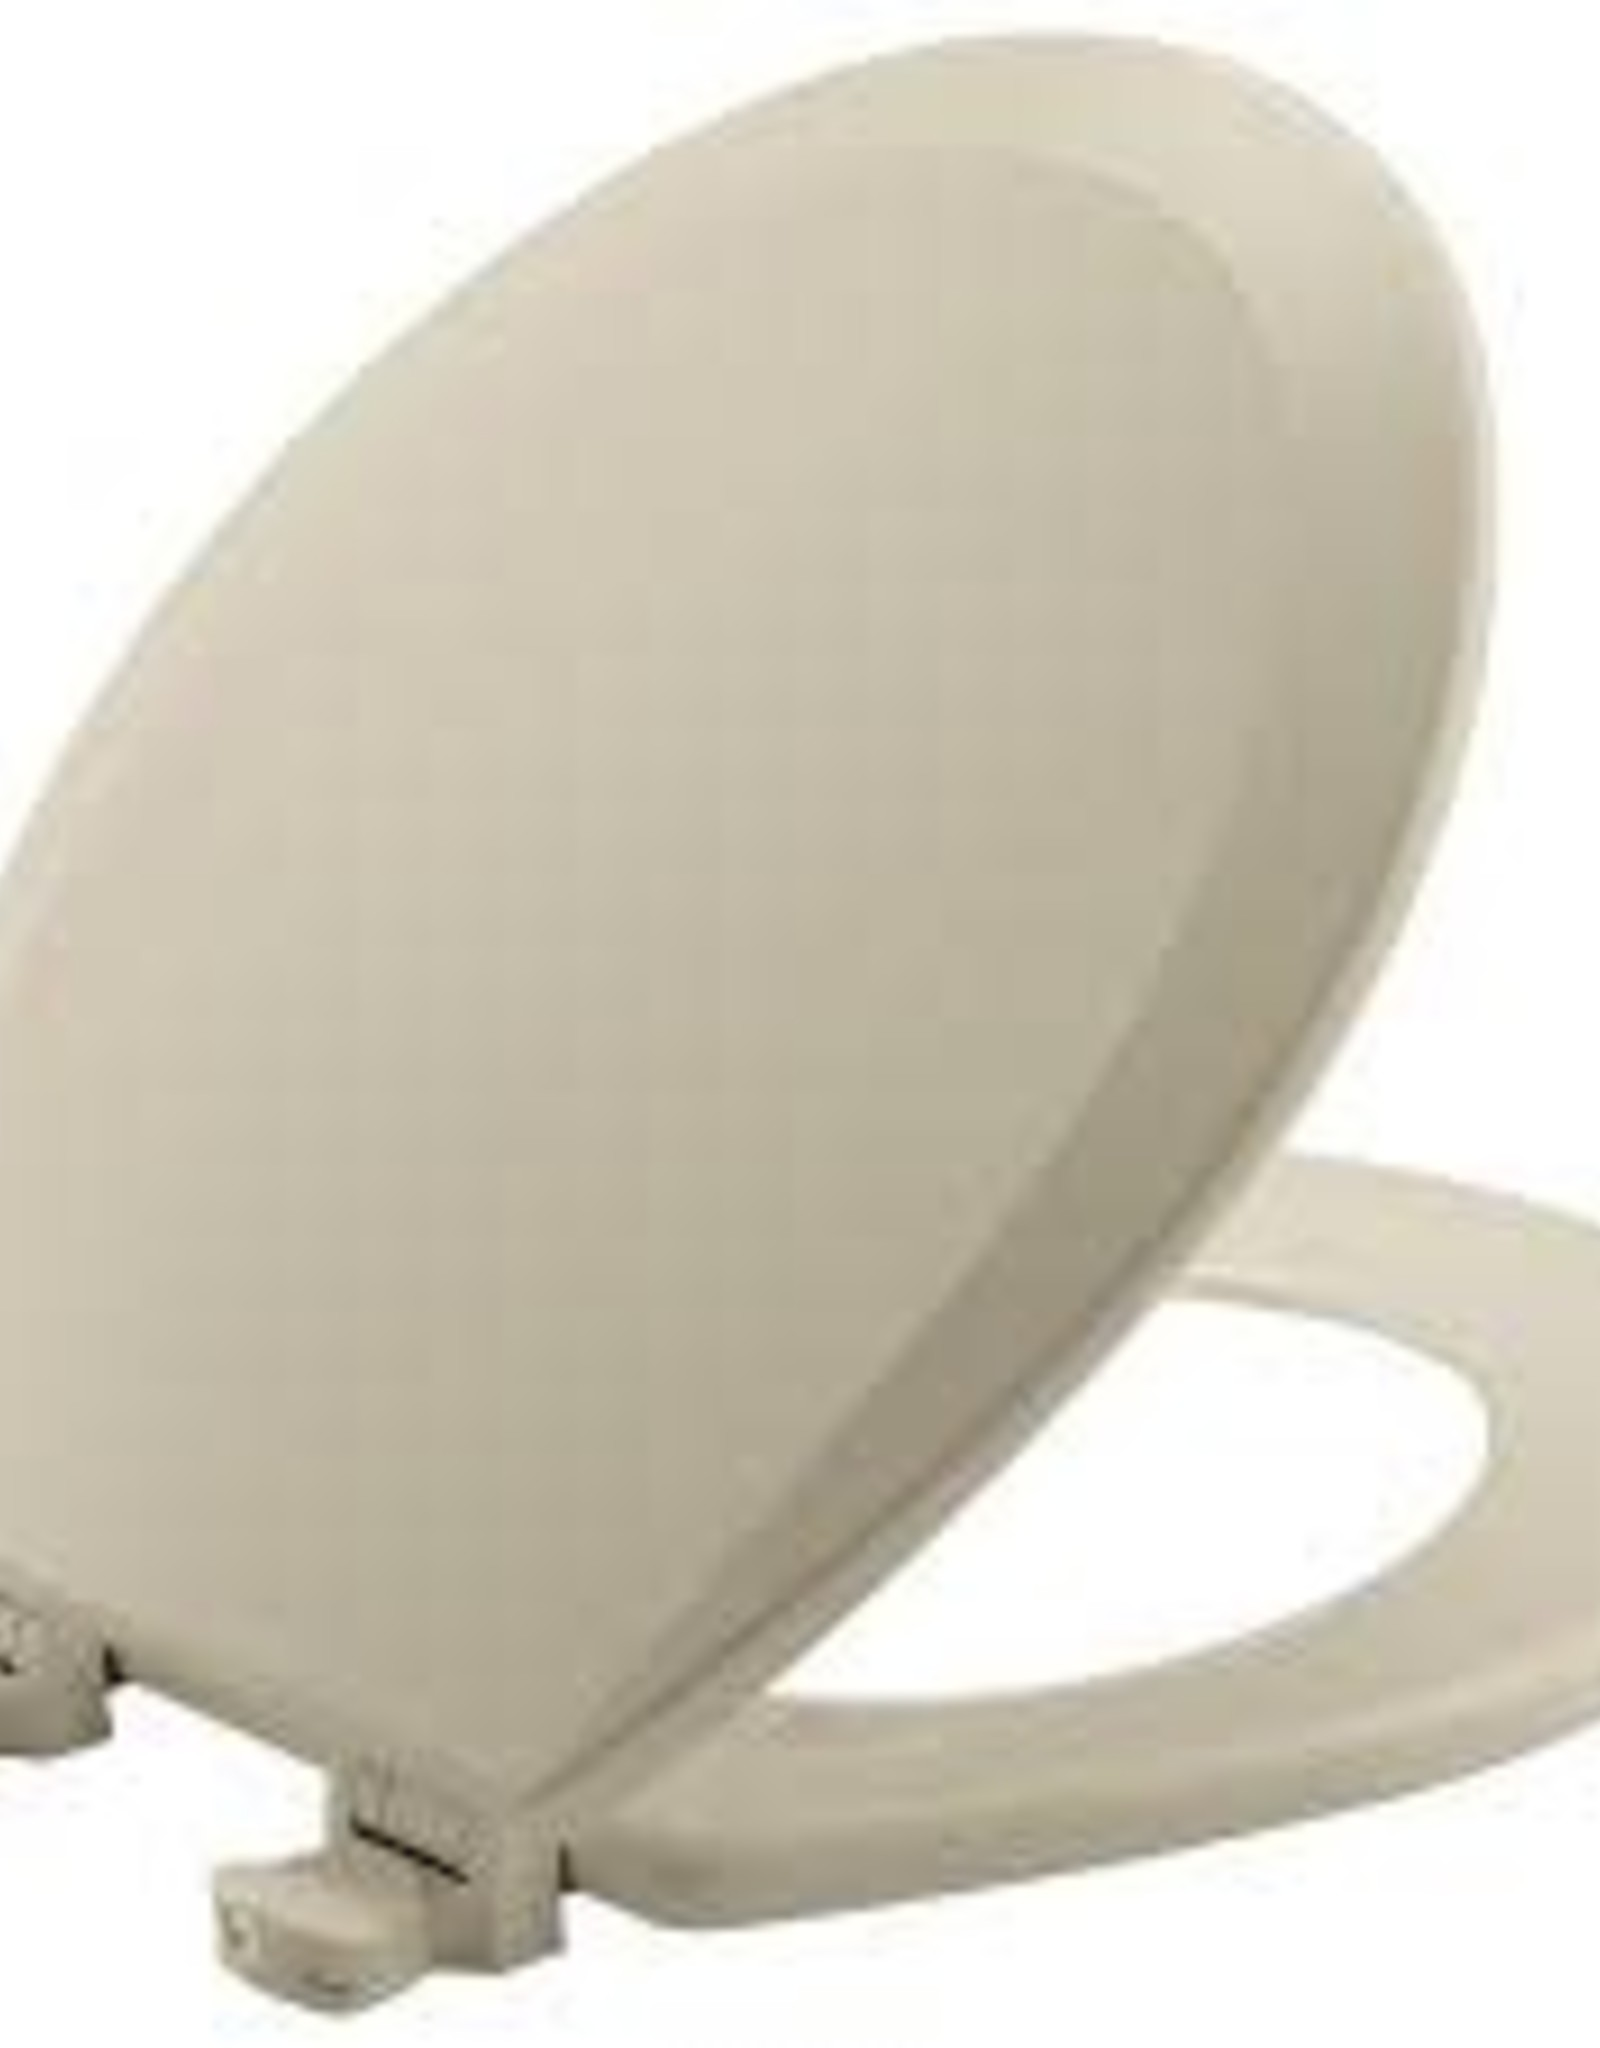 Bemis 730 Round Slow Close Toilet Seat- Biscuit